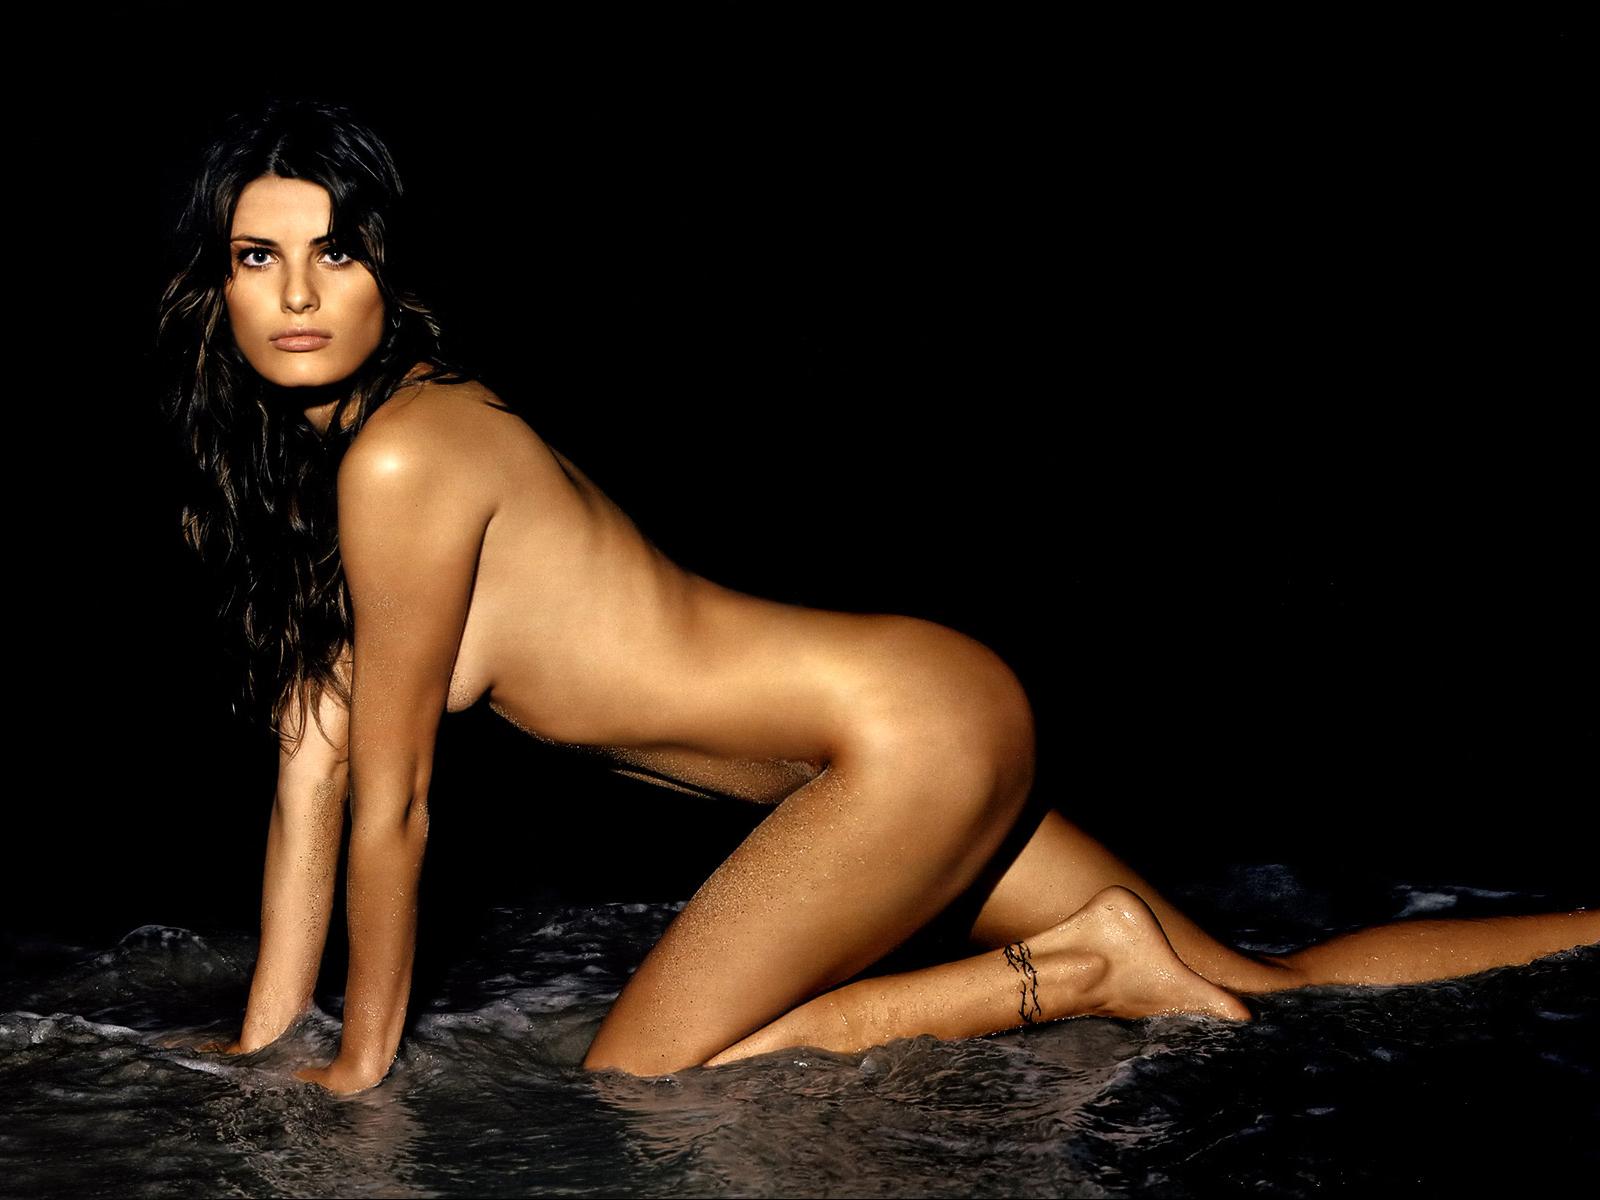 fontana Model hot isabeli